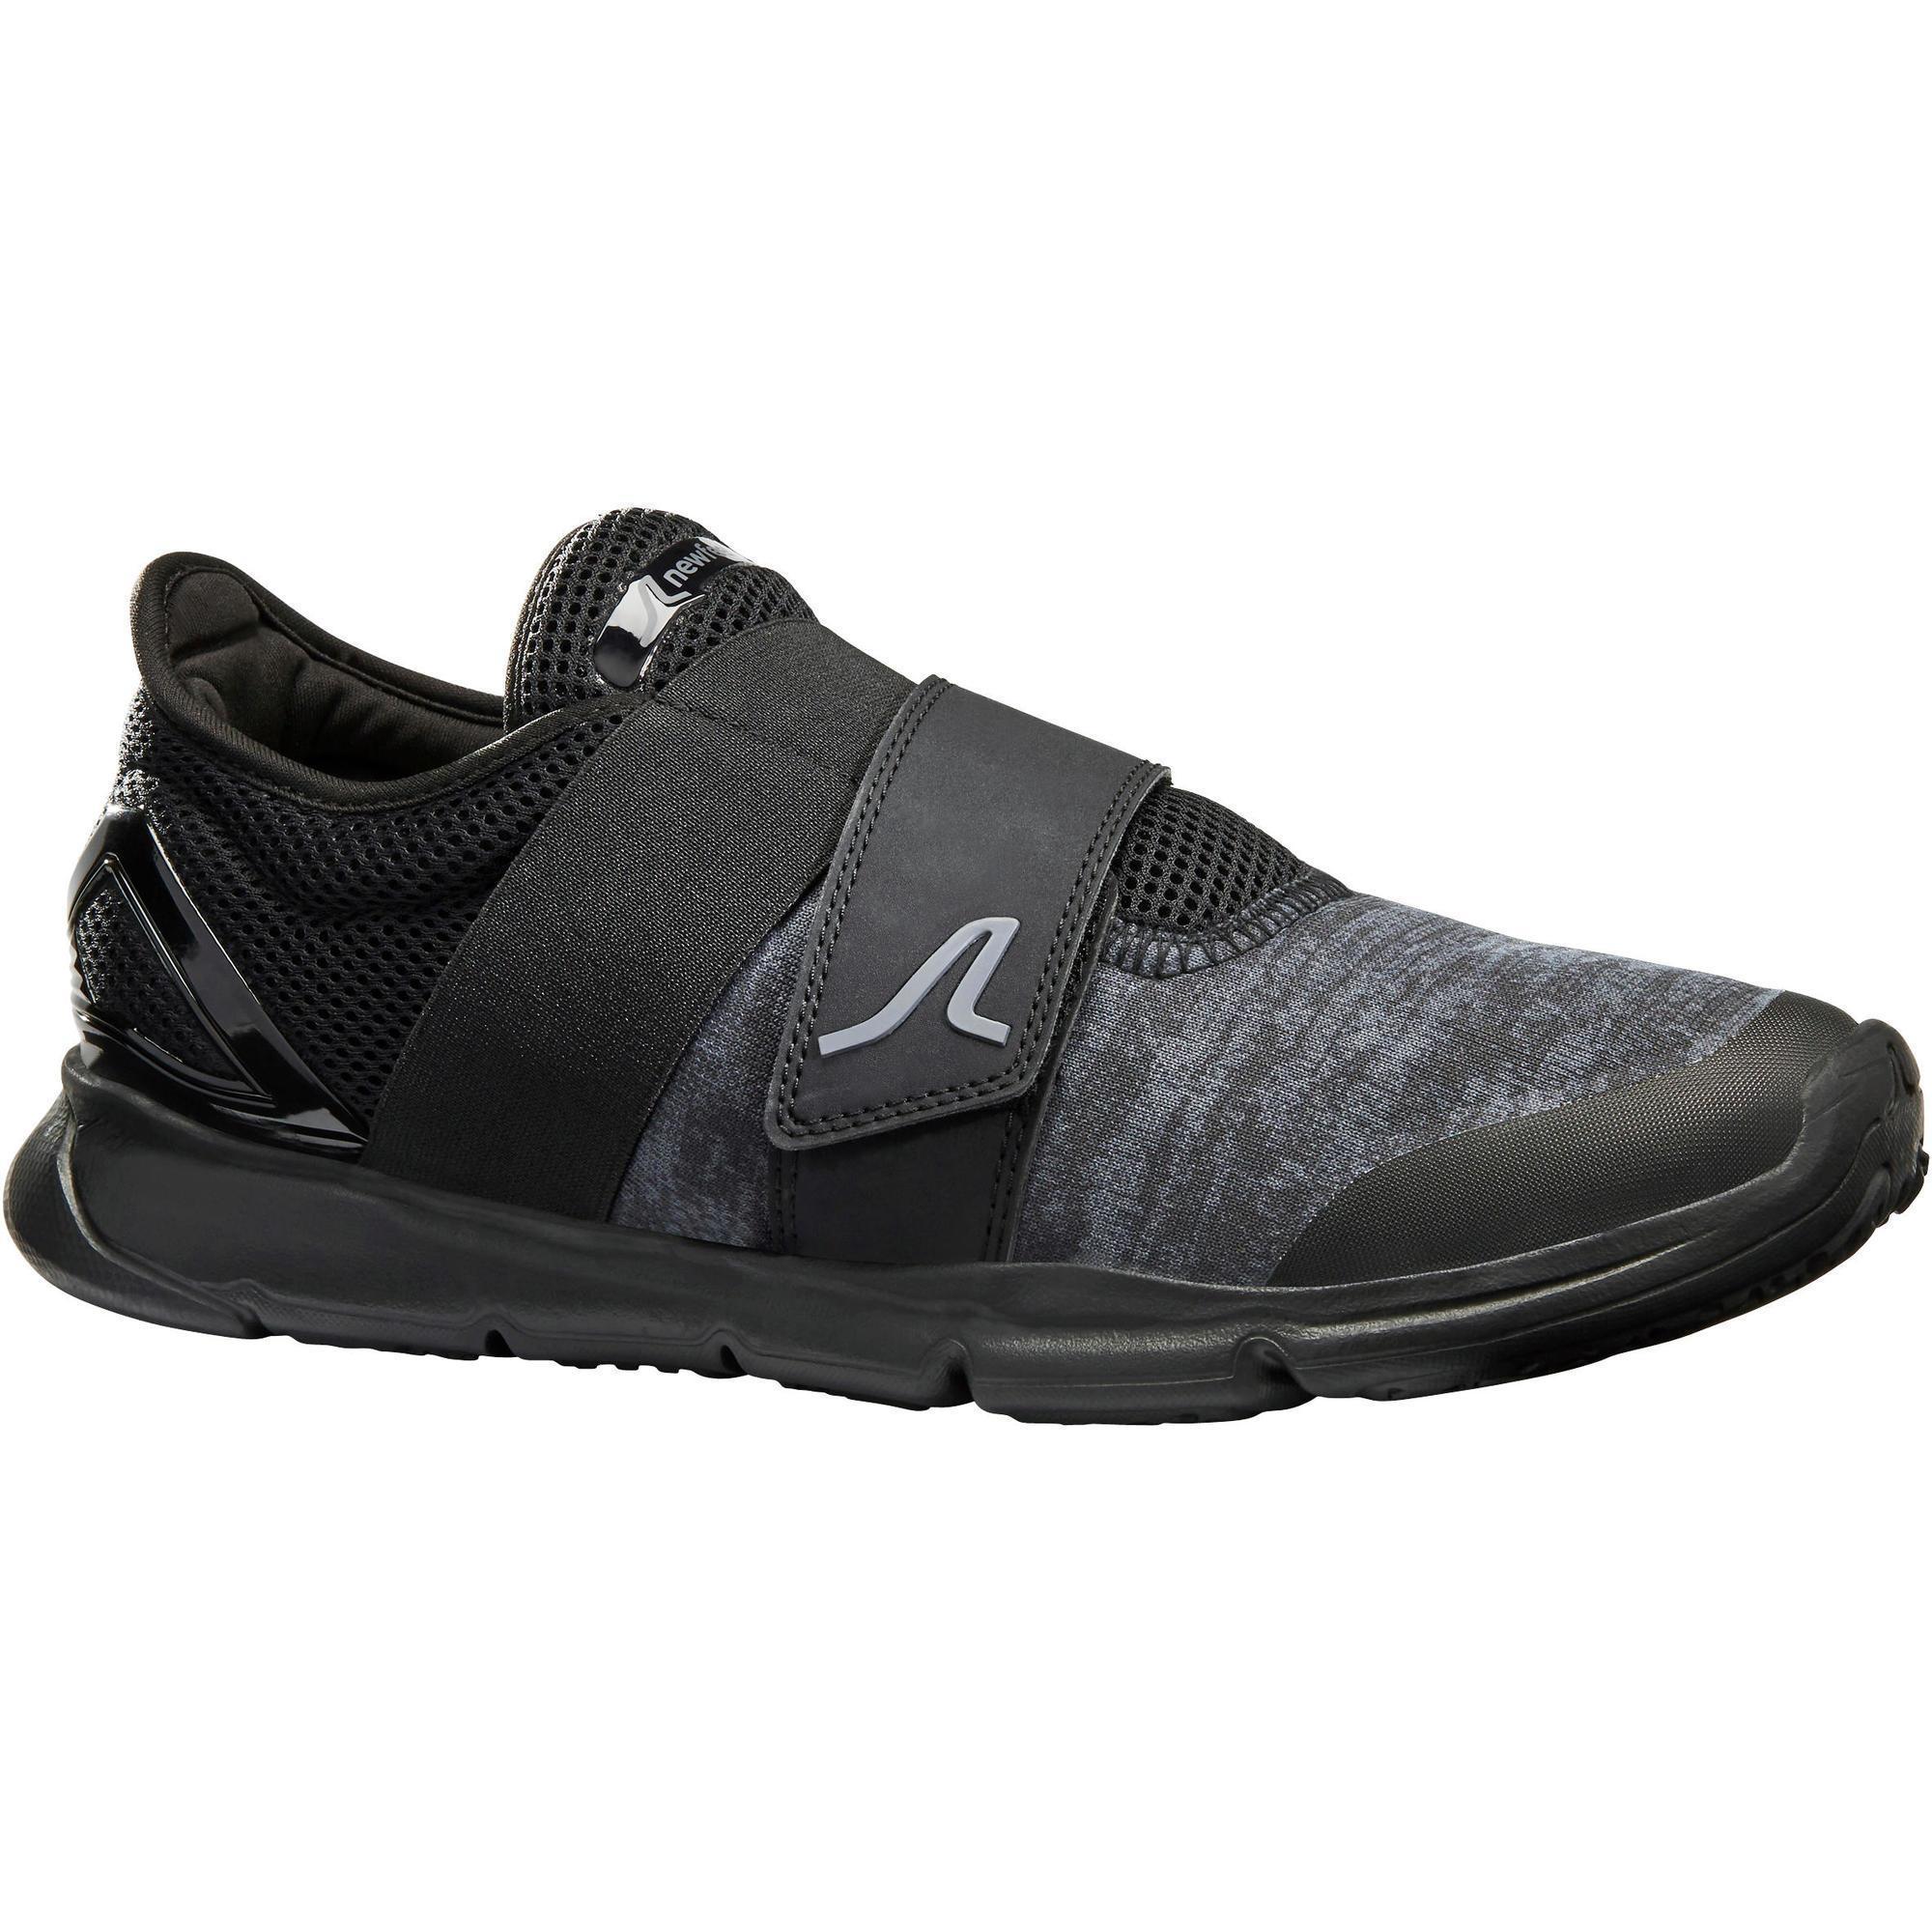 Newfeel Chaussures marche sportive homme Soft 180 Strap noir - Newfeel